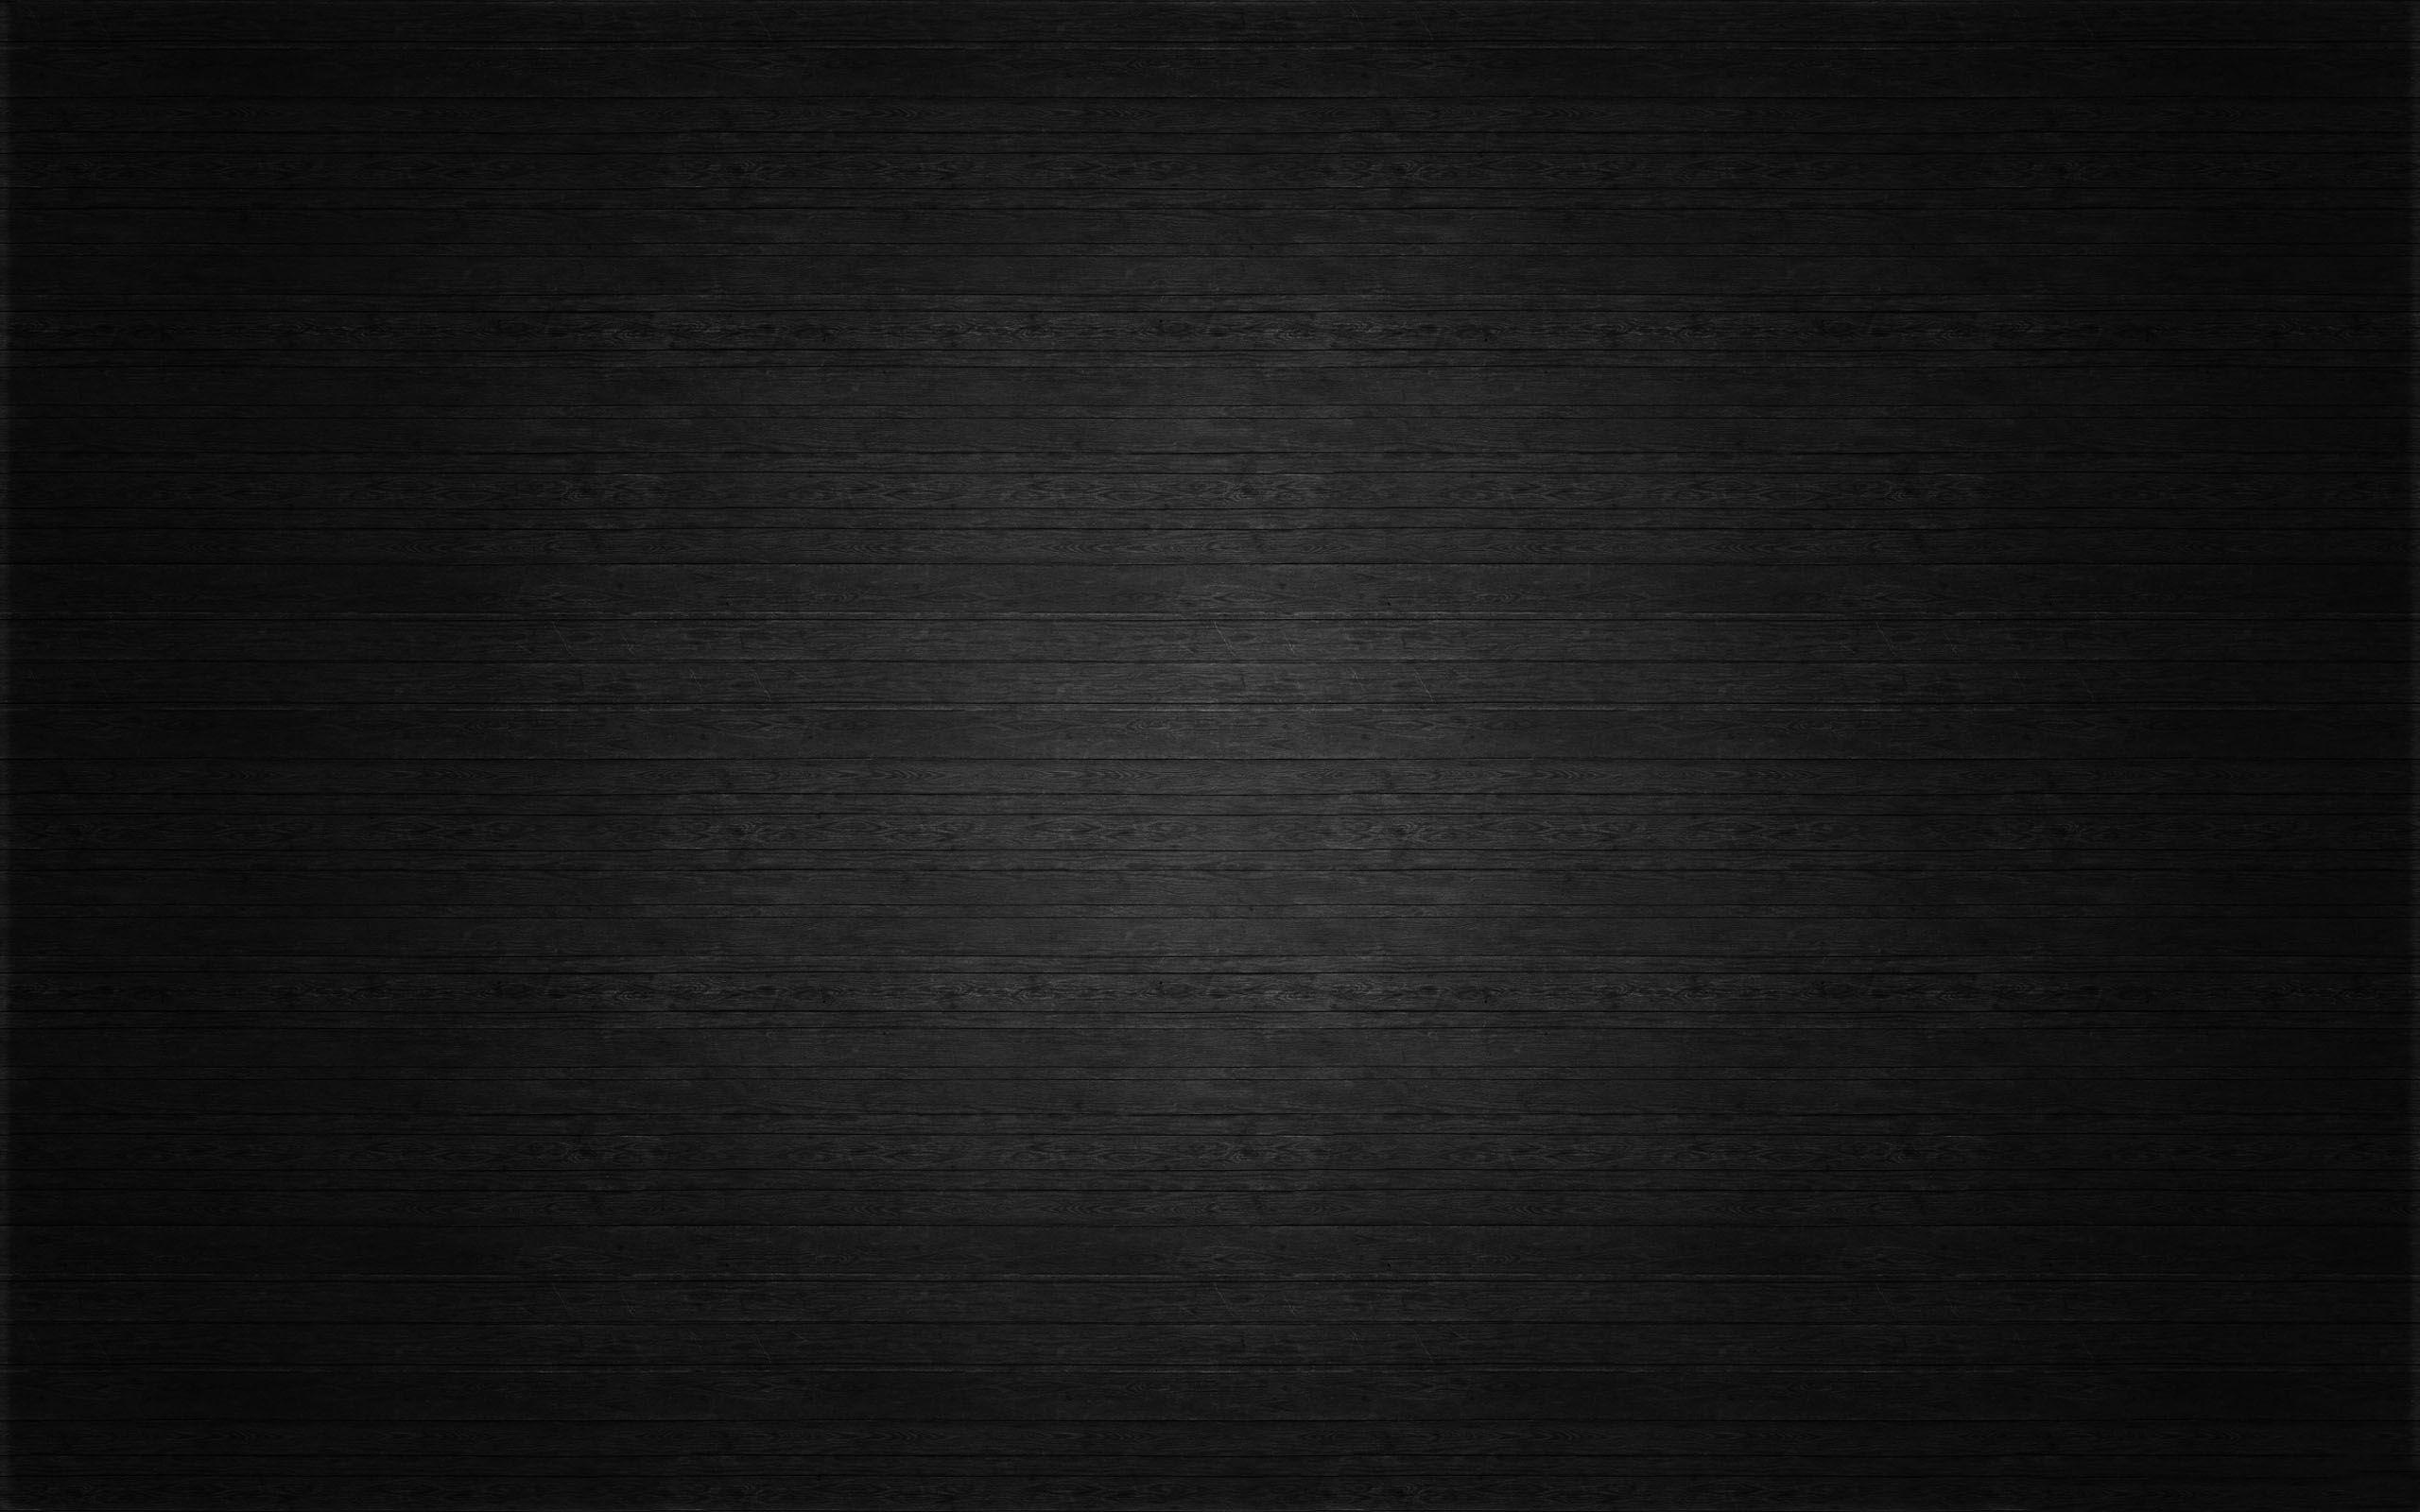 src/components/reusable_components/images/dark.jpg